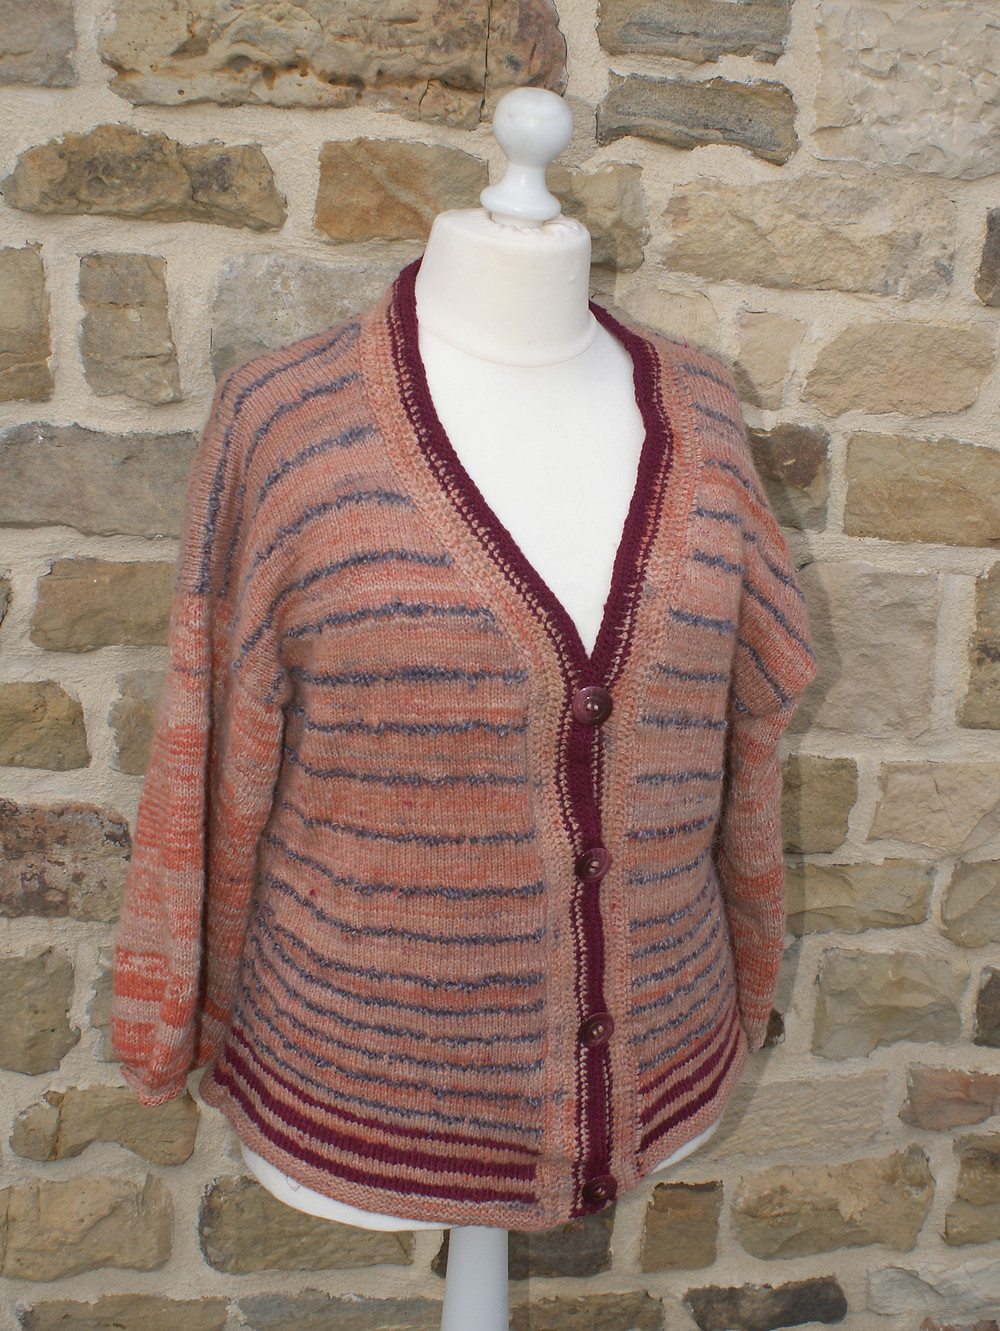 Gilet mérinos tricoté main et teinté racine de garance